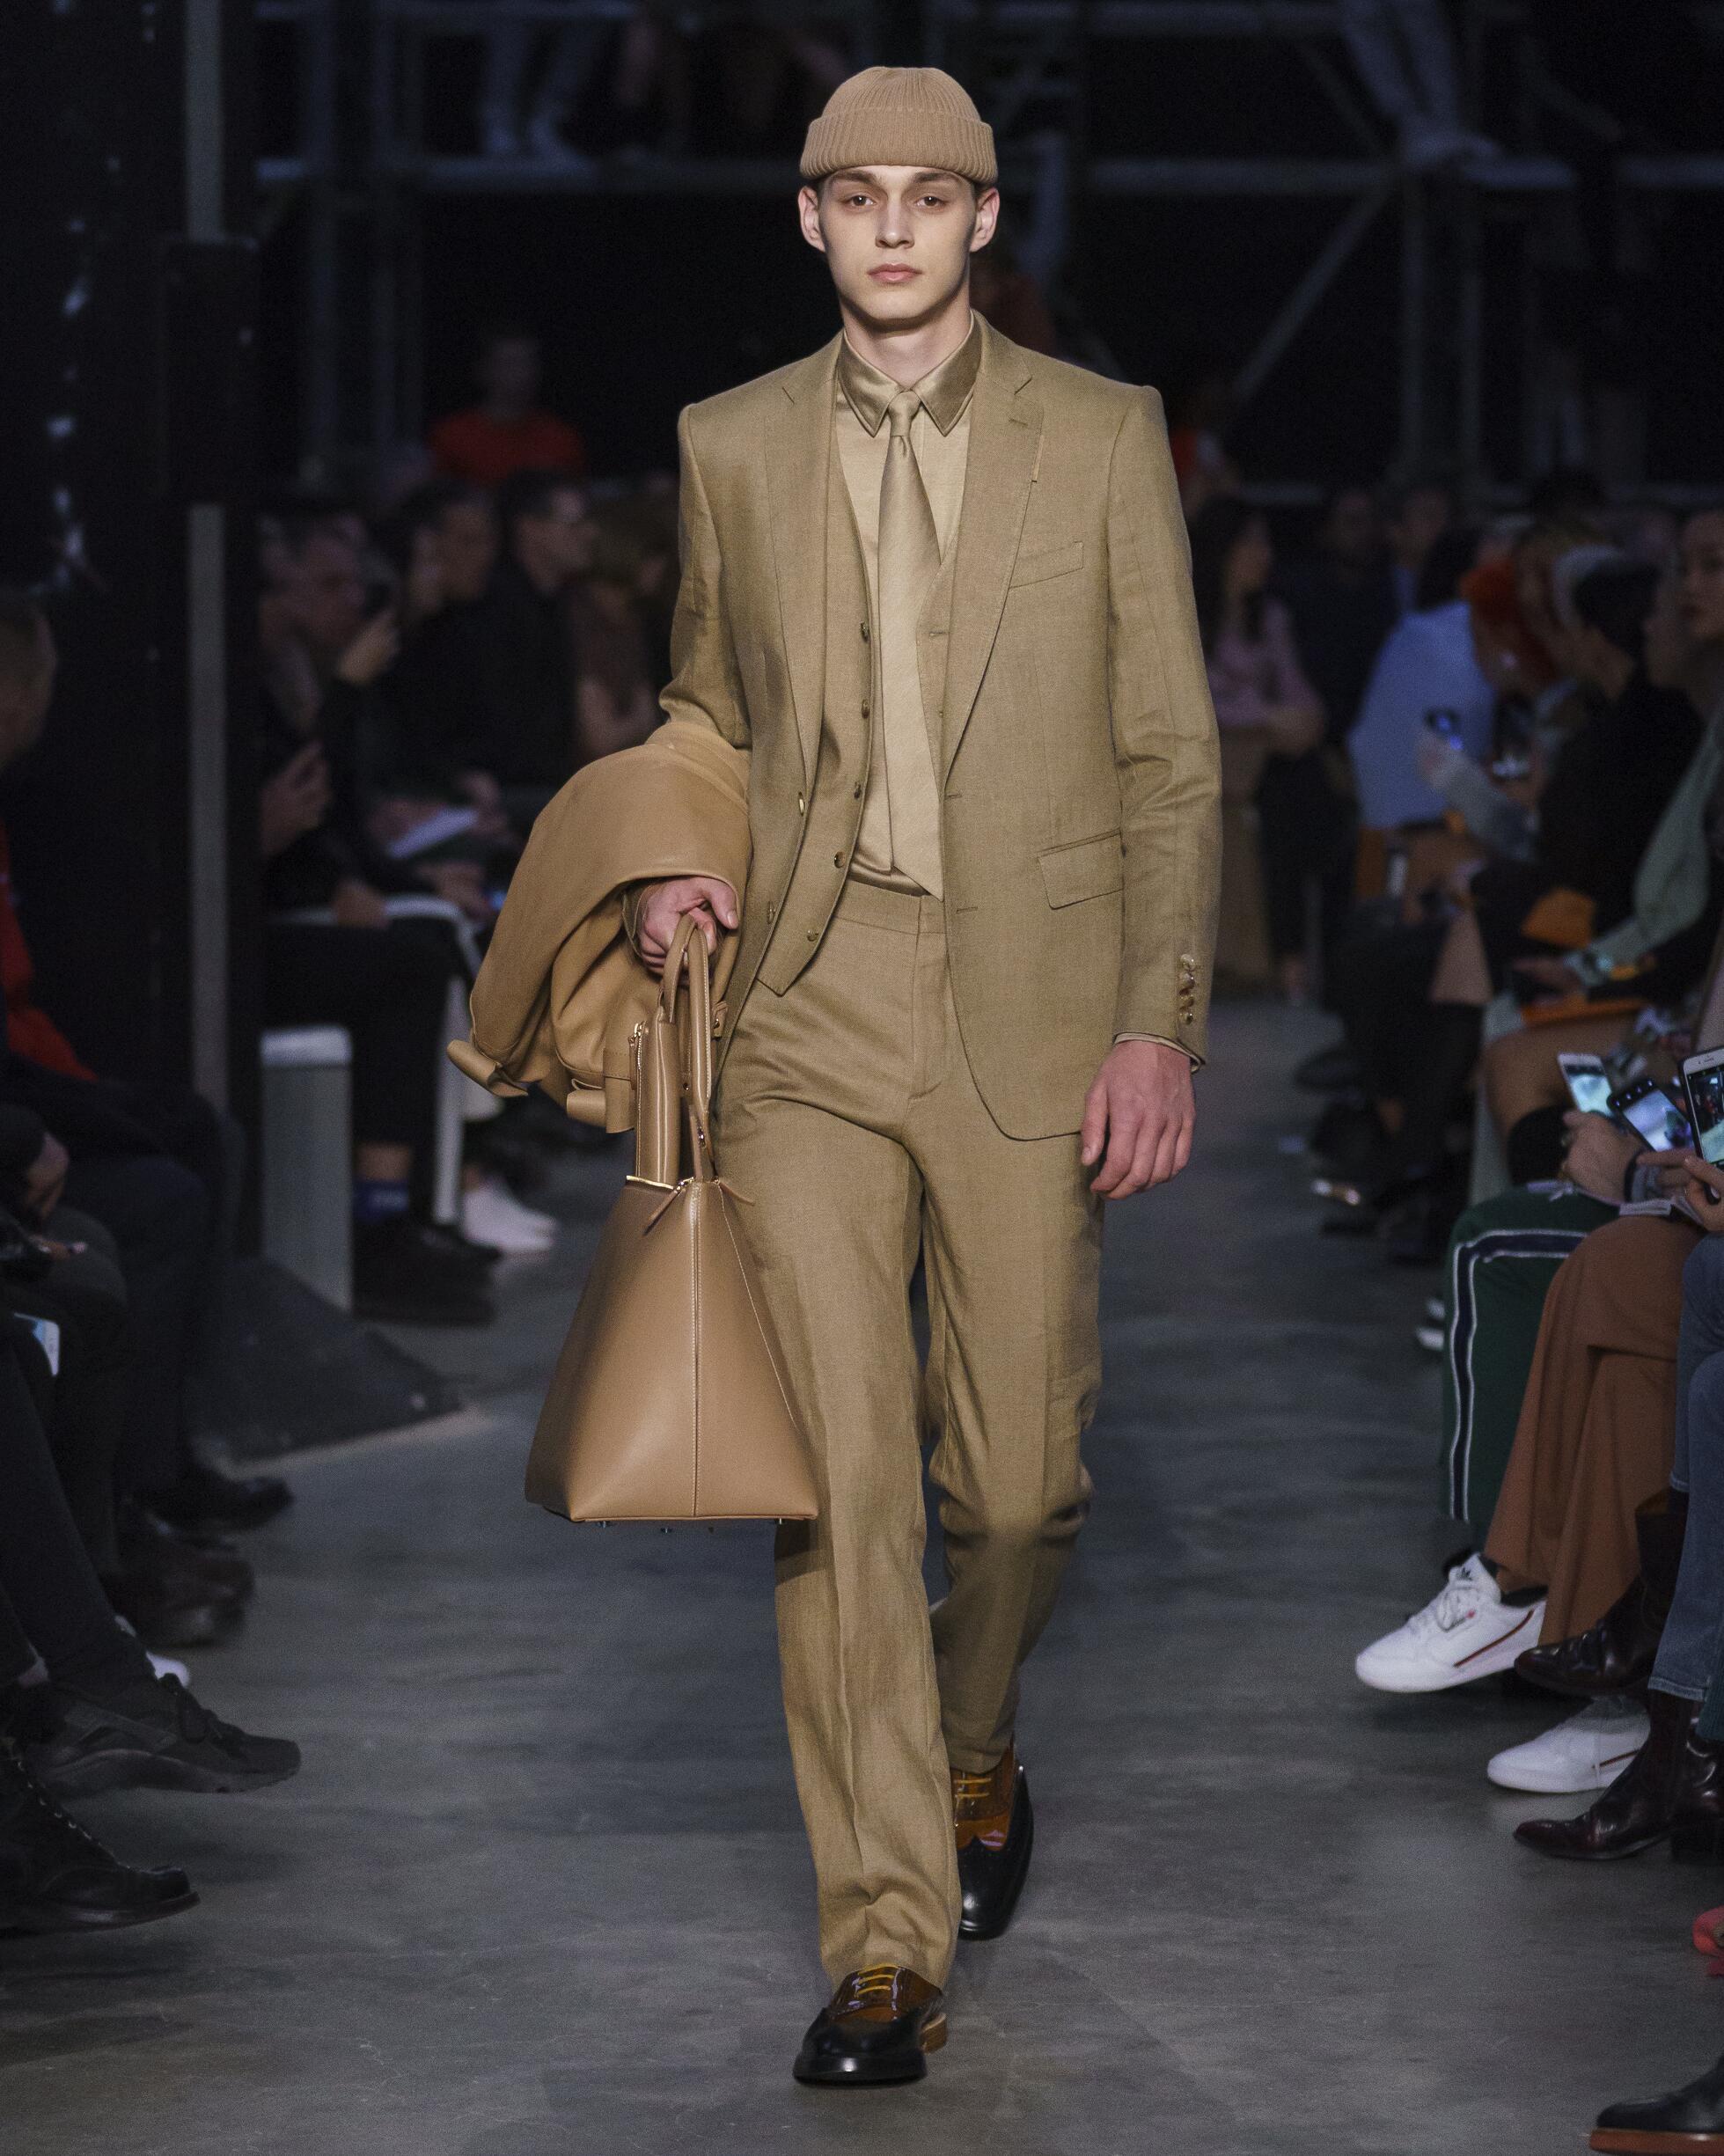 Burberry Menswear Suit Trends